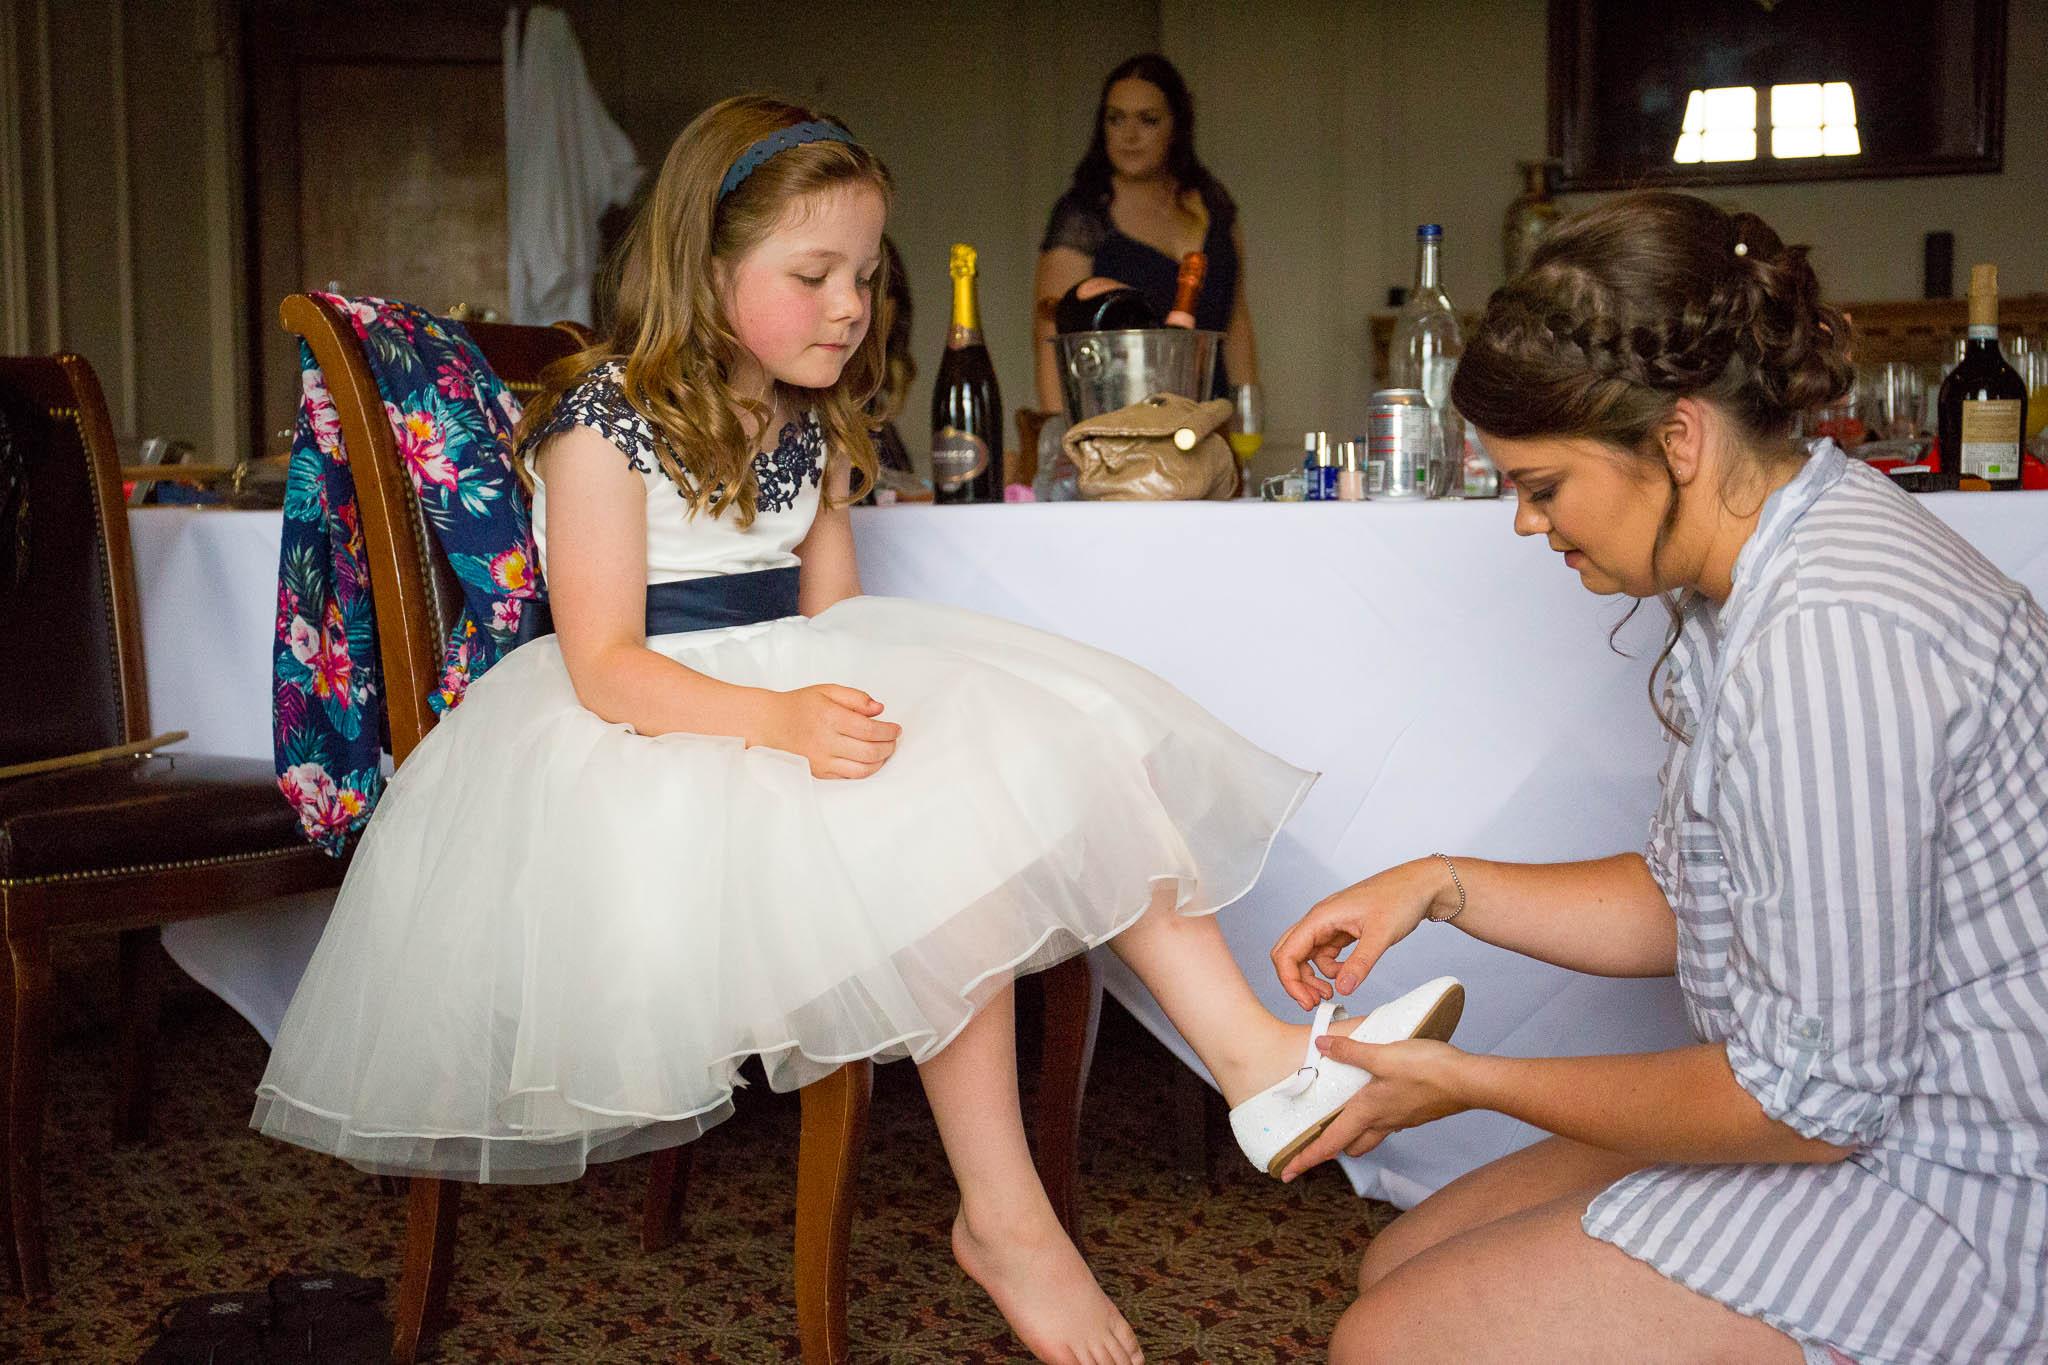 Crathorne Hall Hotel Wedding Photographer37.jpg